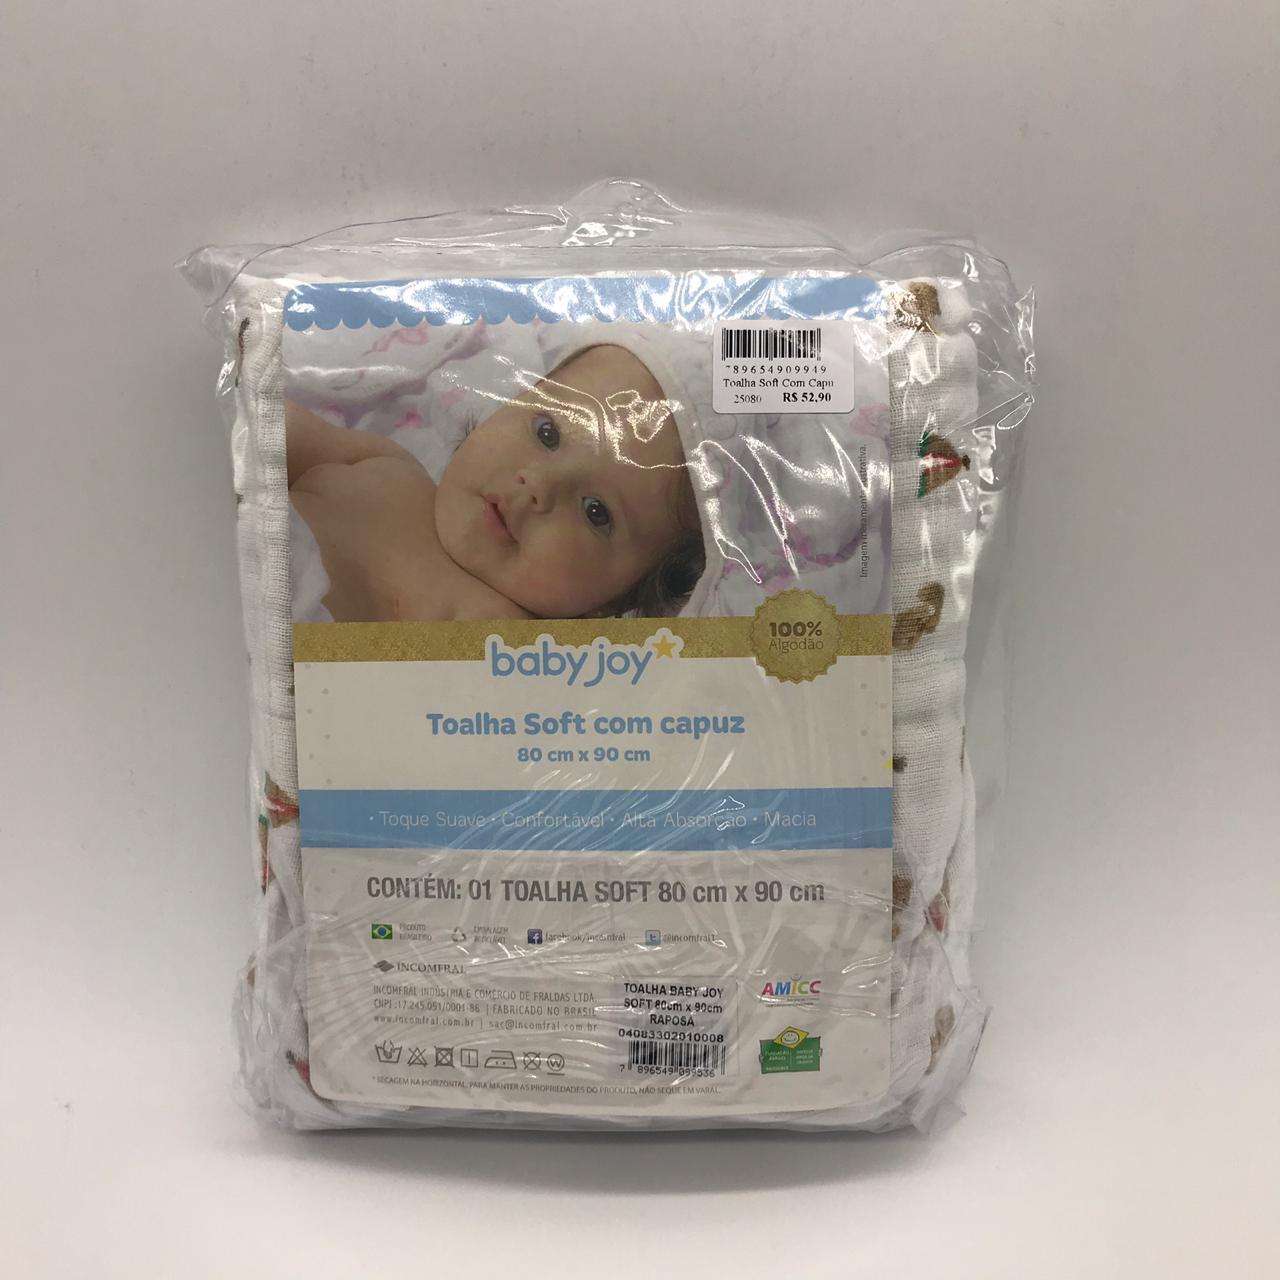 Toalha Soft Capuz Raposa - Baby Joy Incomfral Ref 04083302010008